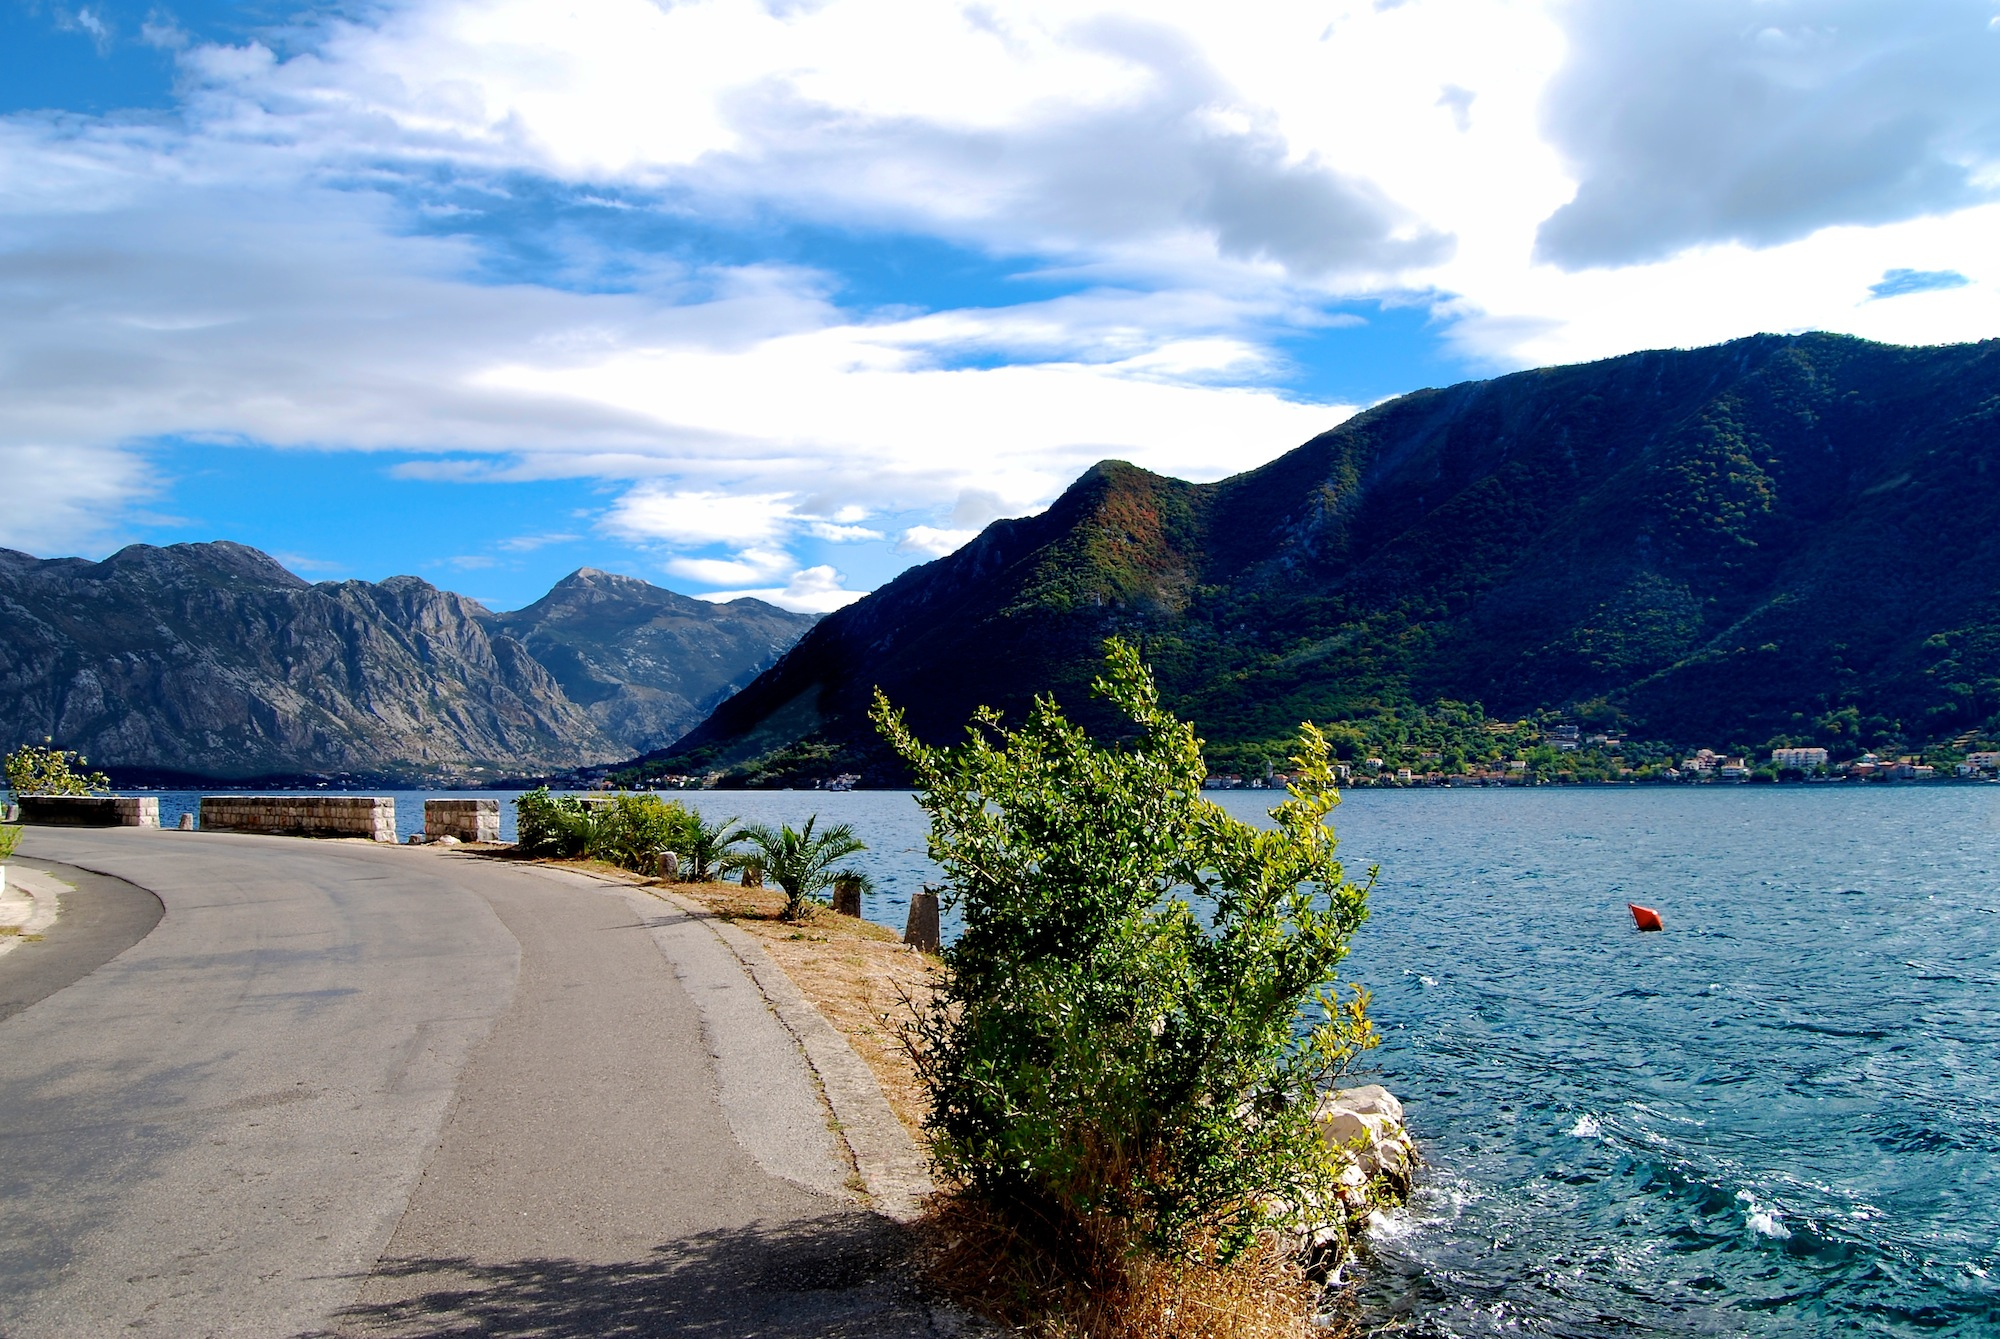 Scenic coastal road along Kotor Bay